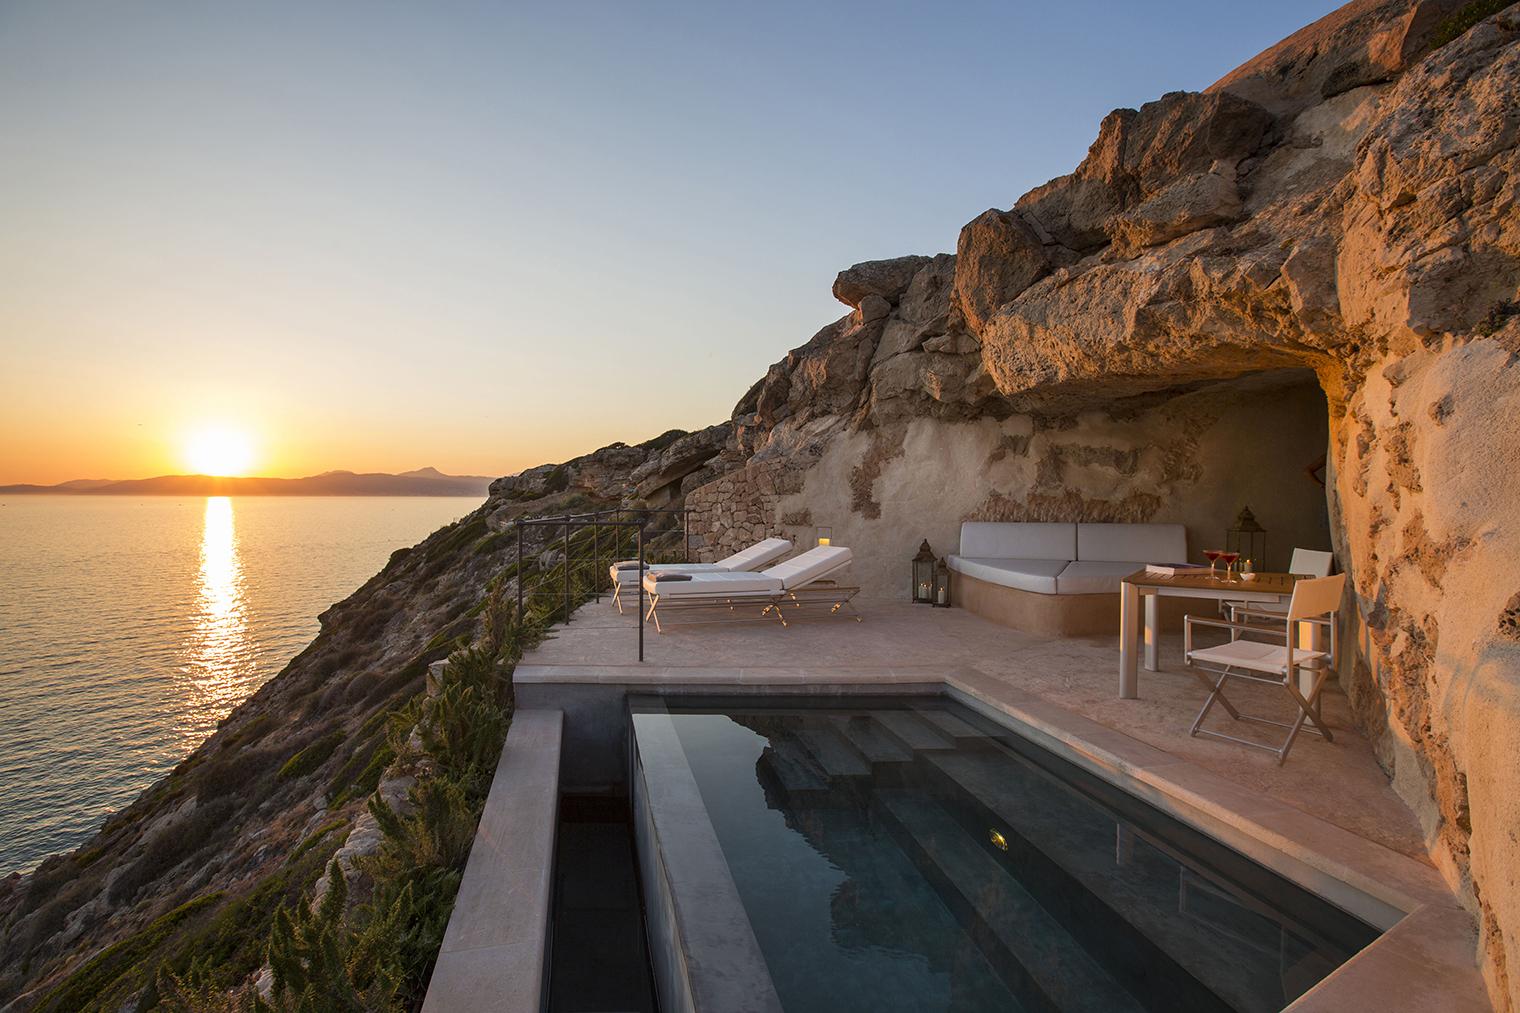 Hotel cap rocat en mallorca una fortaleza nica - Arquitectos en mallorca ...